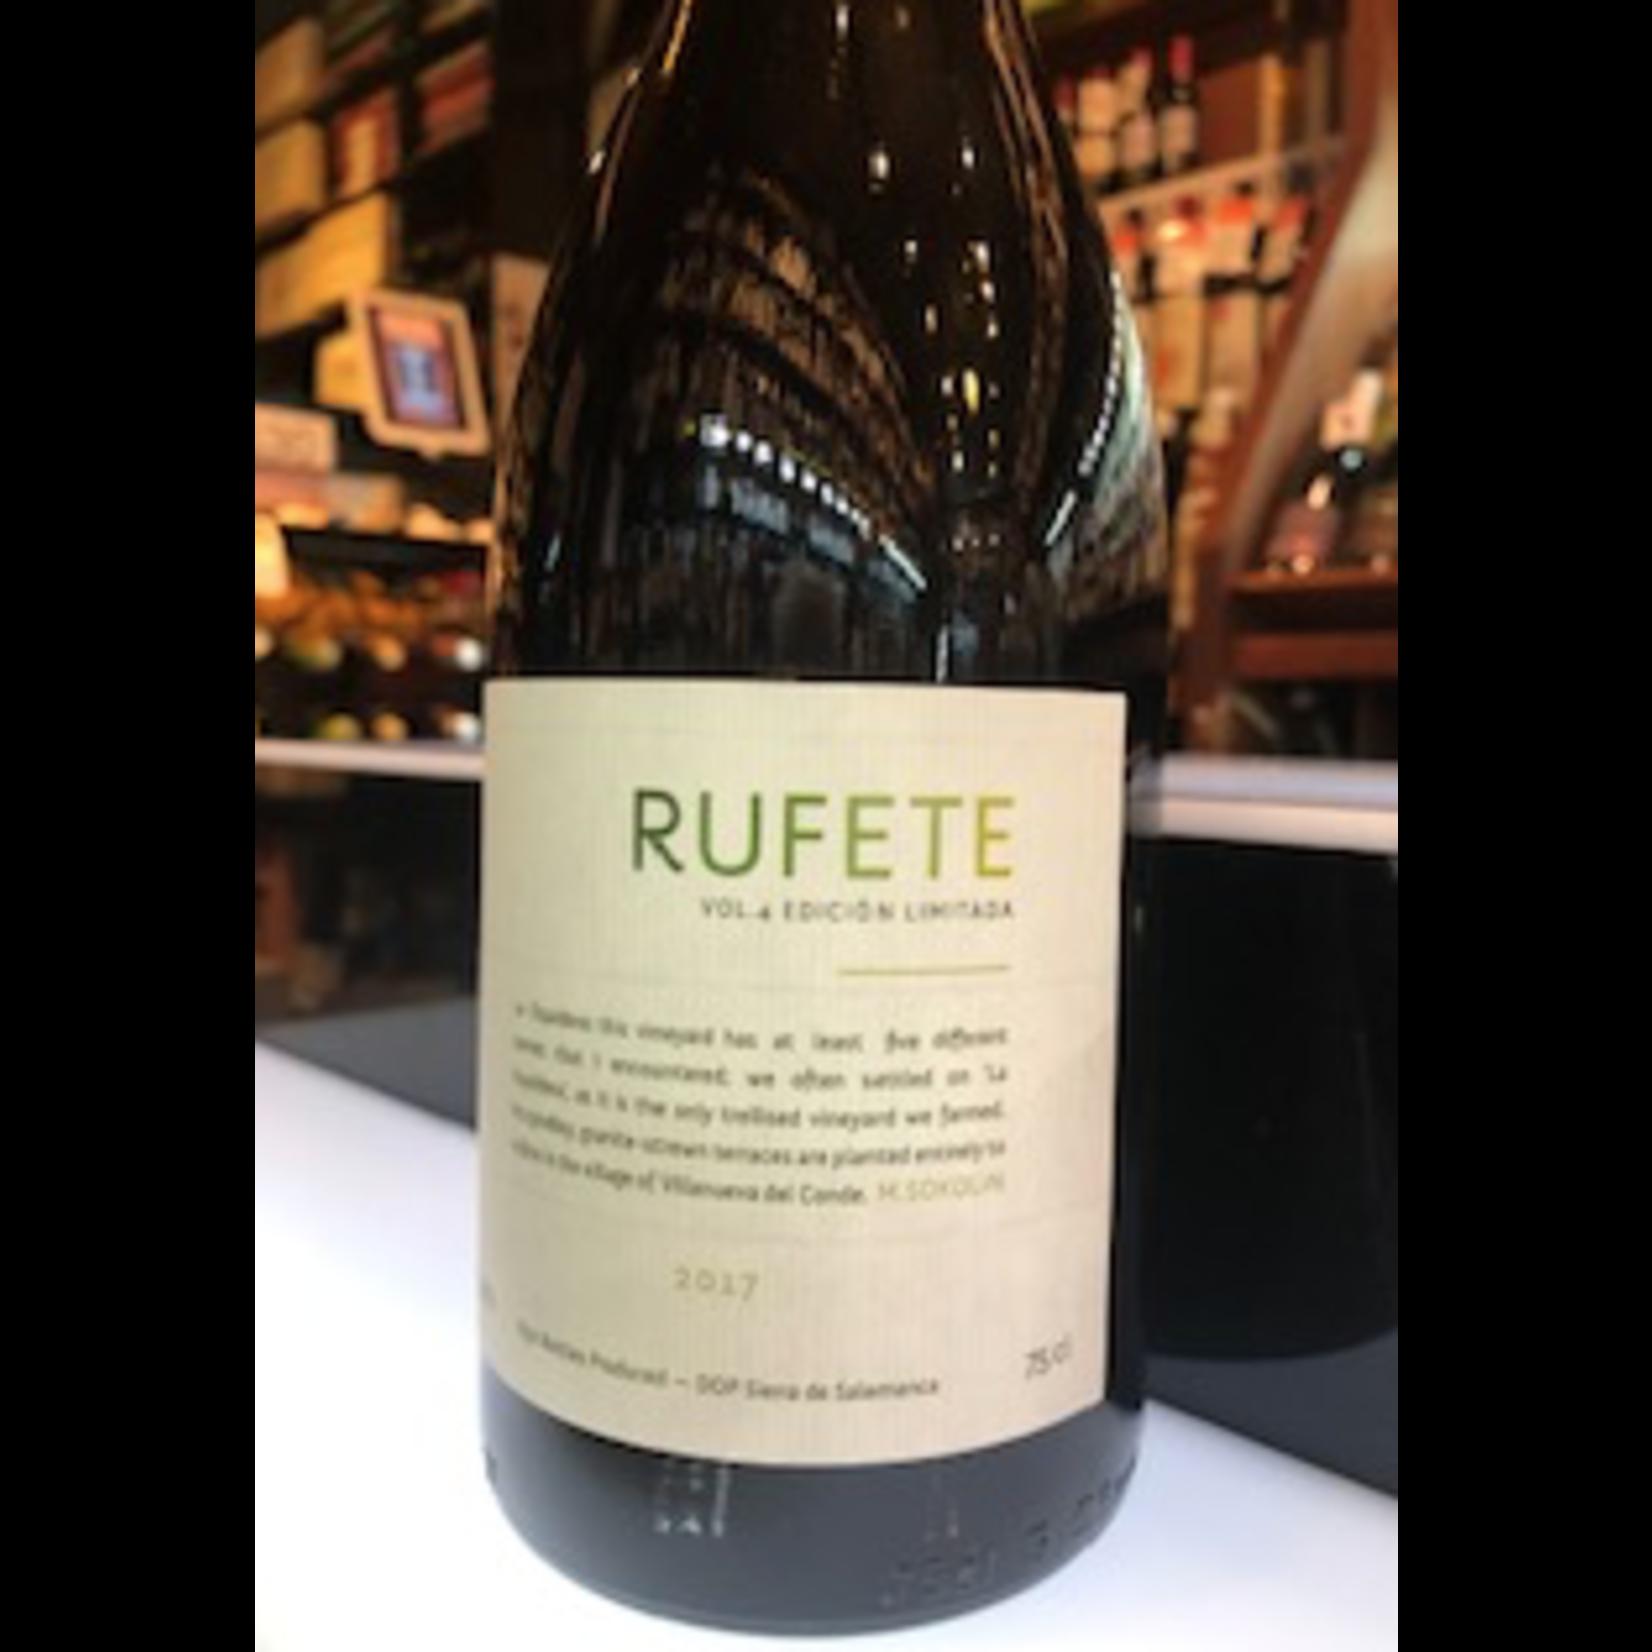 Wine Rufete M Sokolin Sierra de Salamanca Vol 4 Edicion Limitada 2017